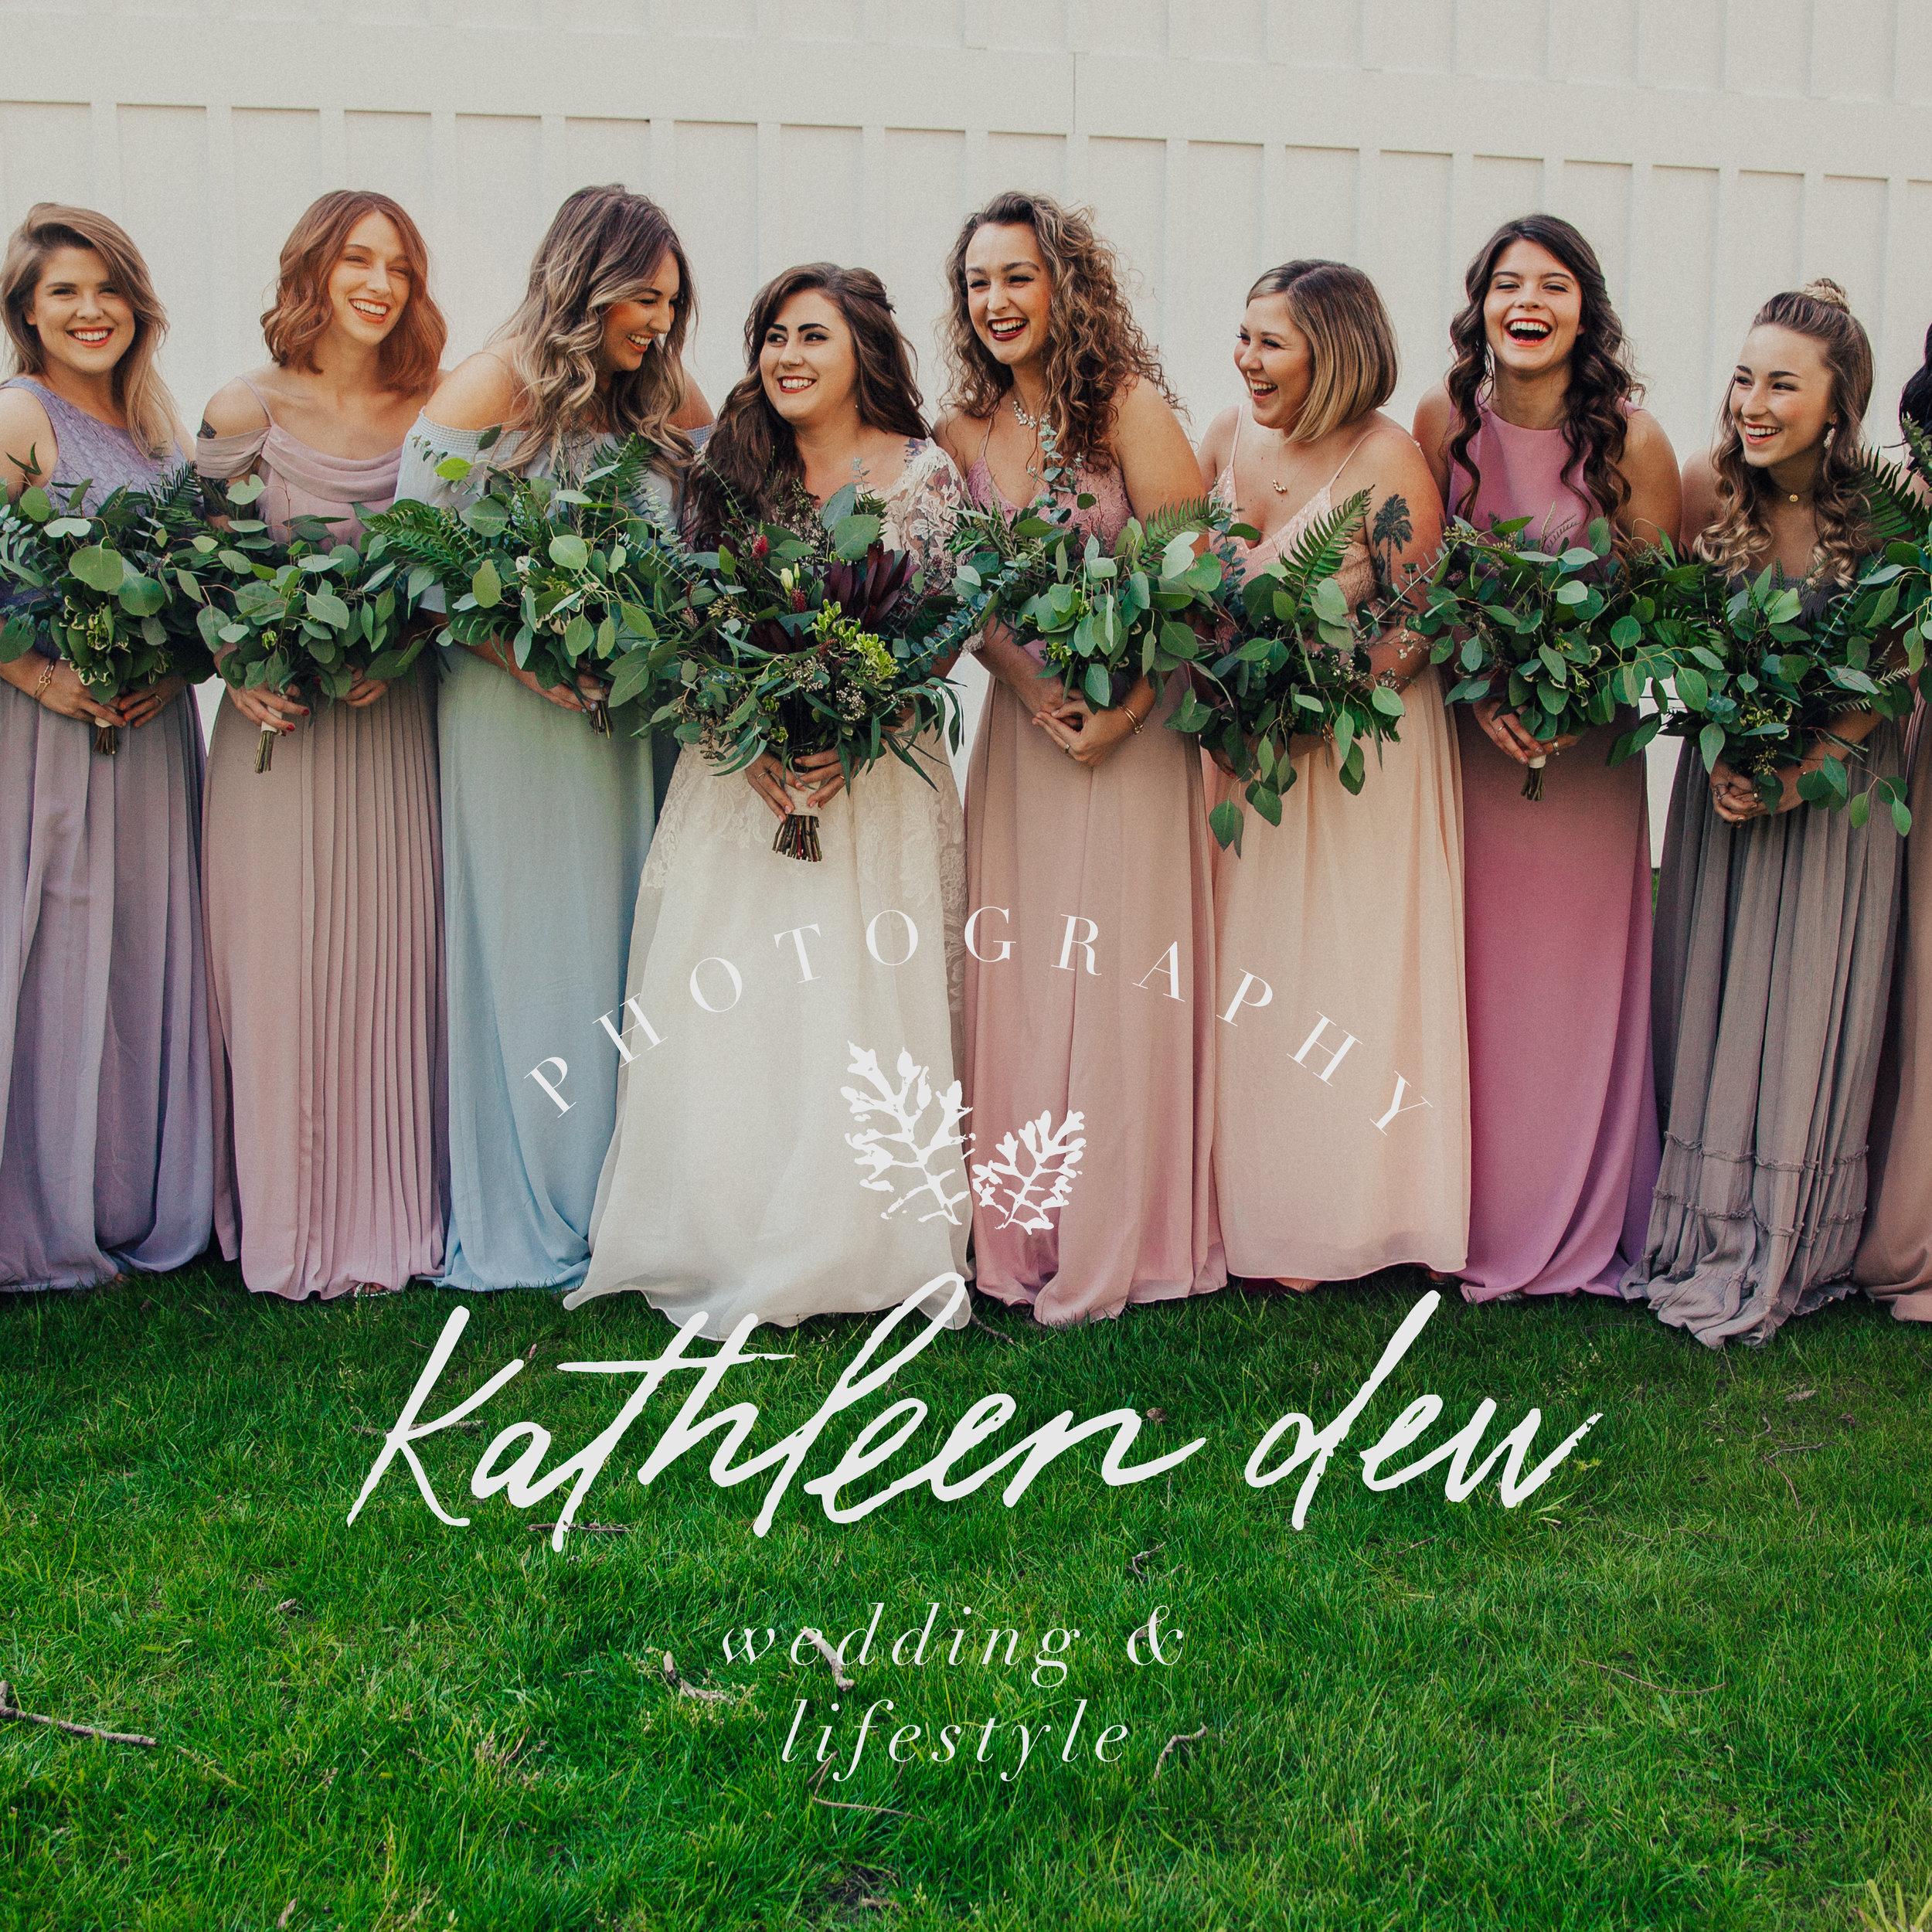 KathleenDew_I+Mwebphotos-1.jpg